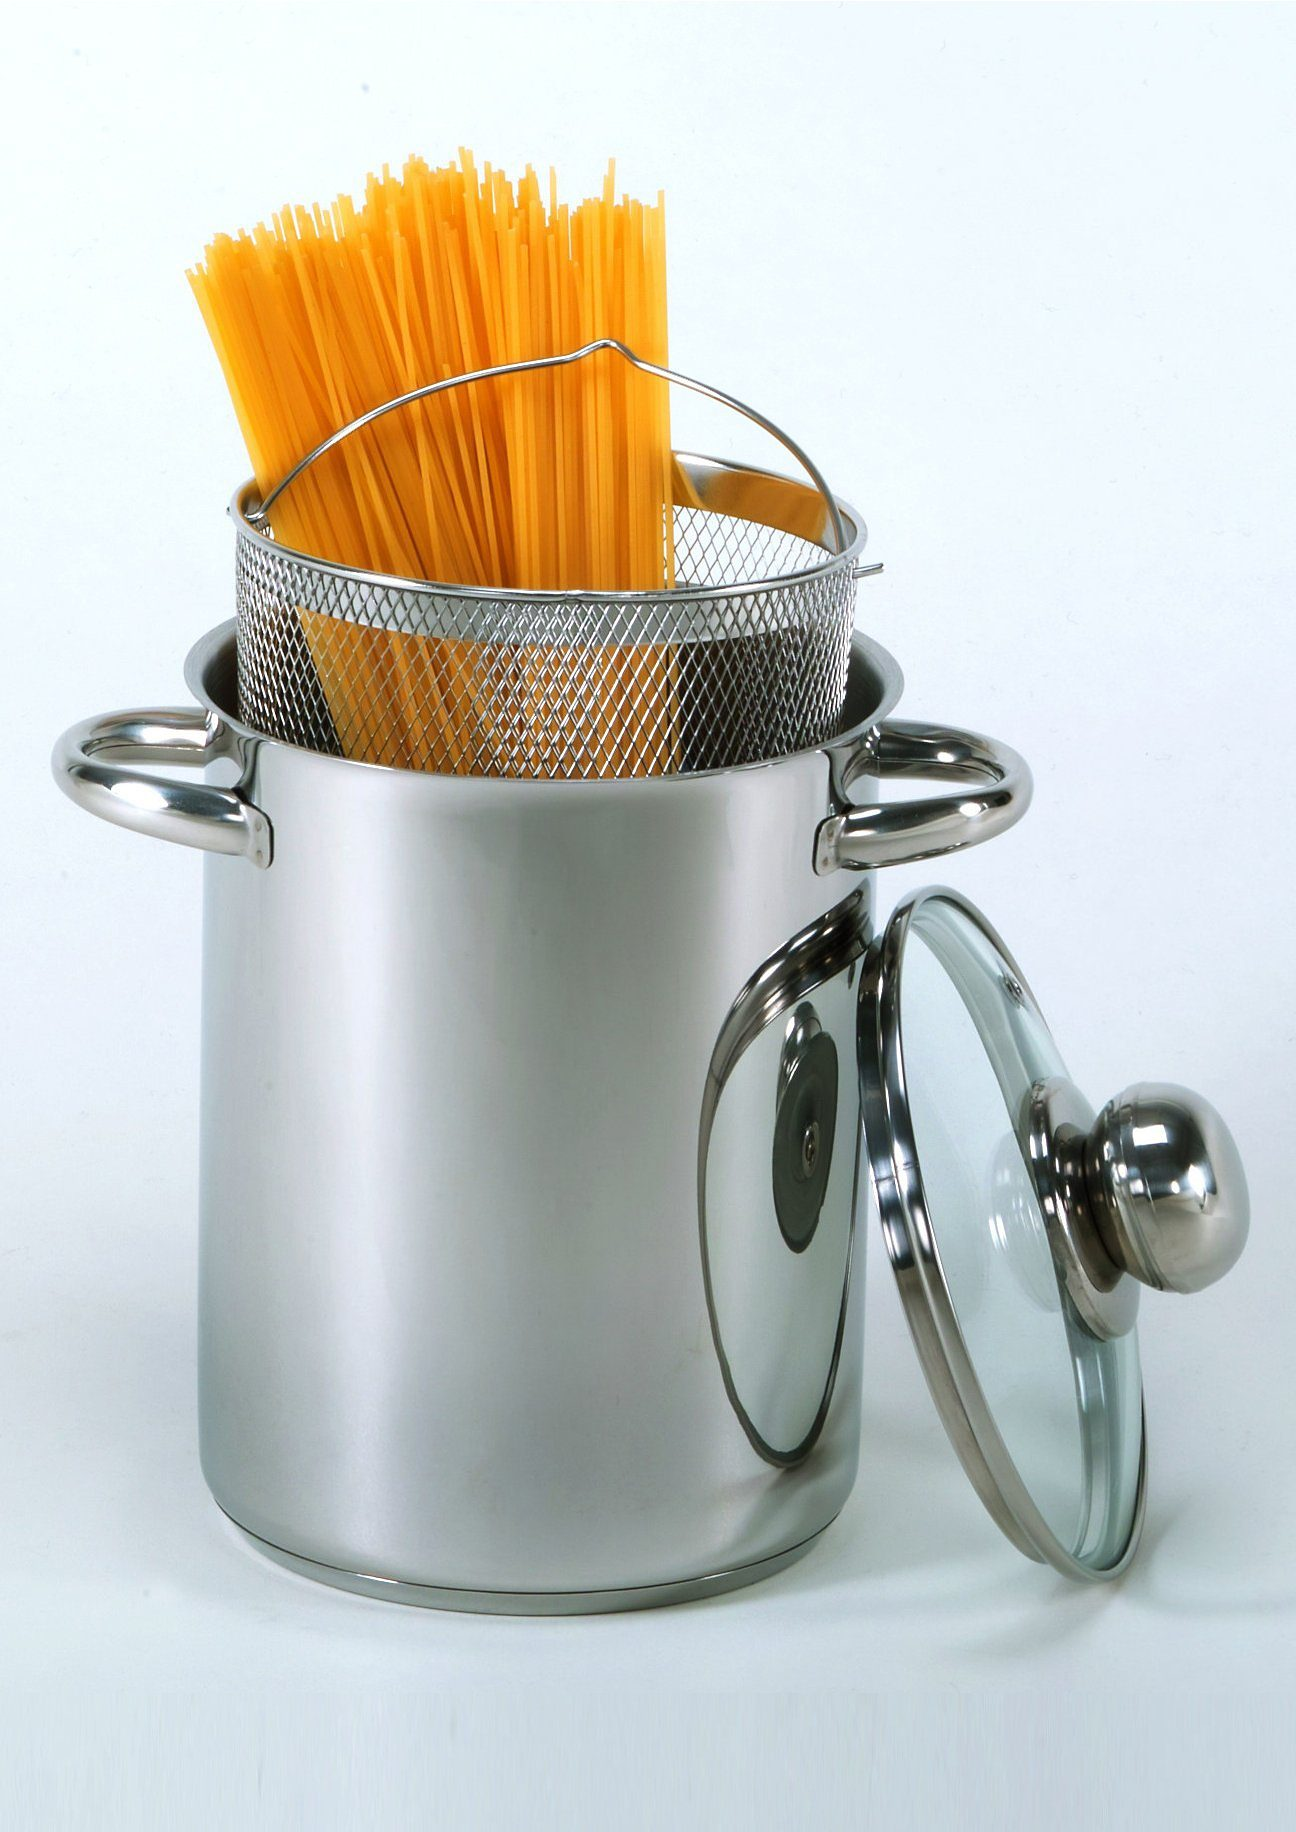 Krüger Spargeltopf, Edelstahl, (1 tlg.) silberfarben Spaghettitöpfe Töpfe Haushaltswaren Spargeltopf